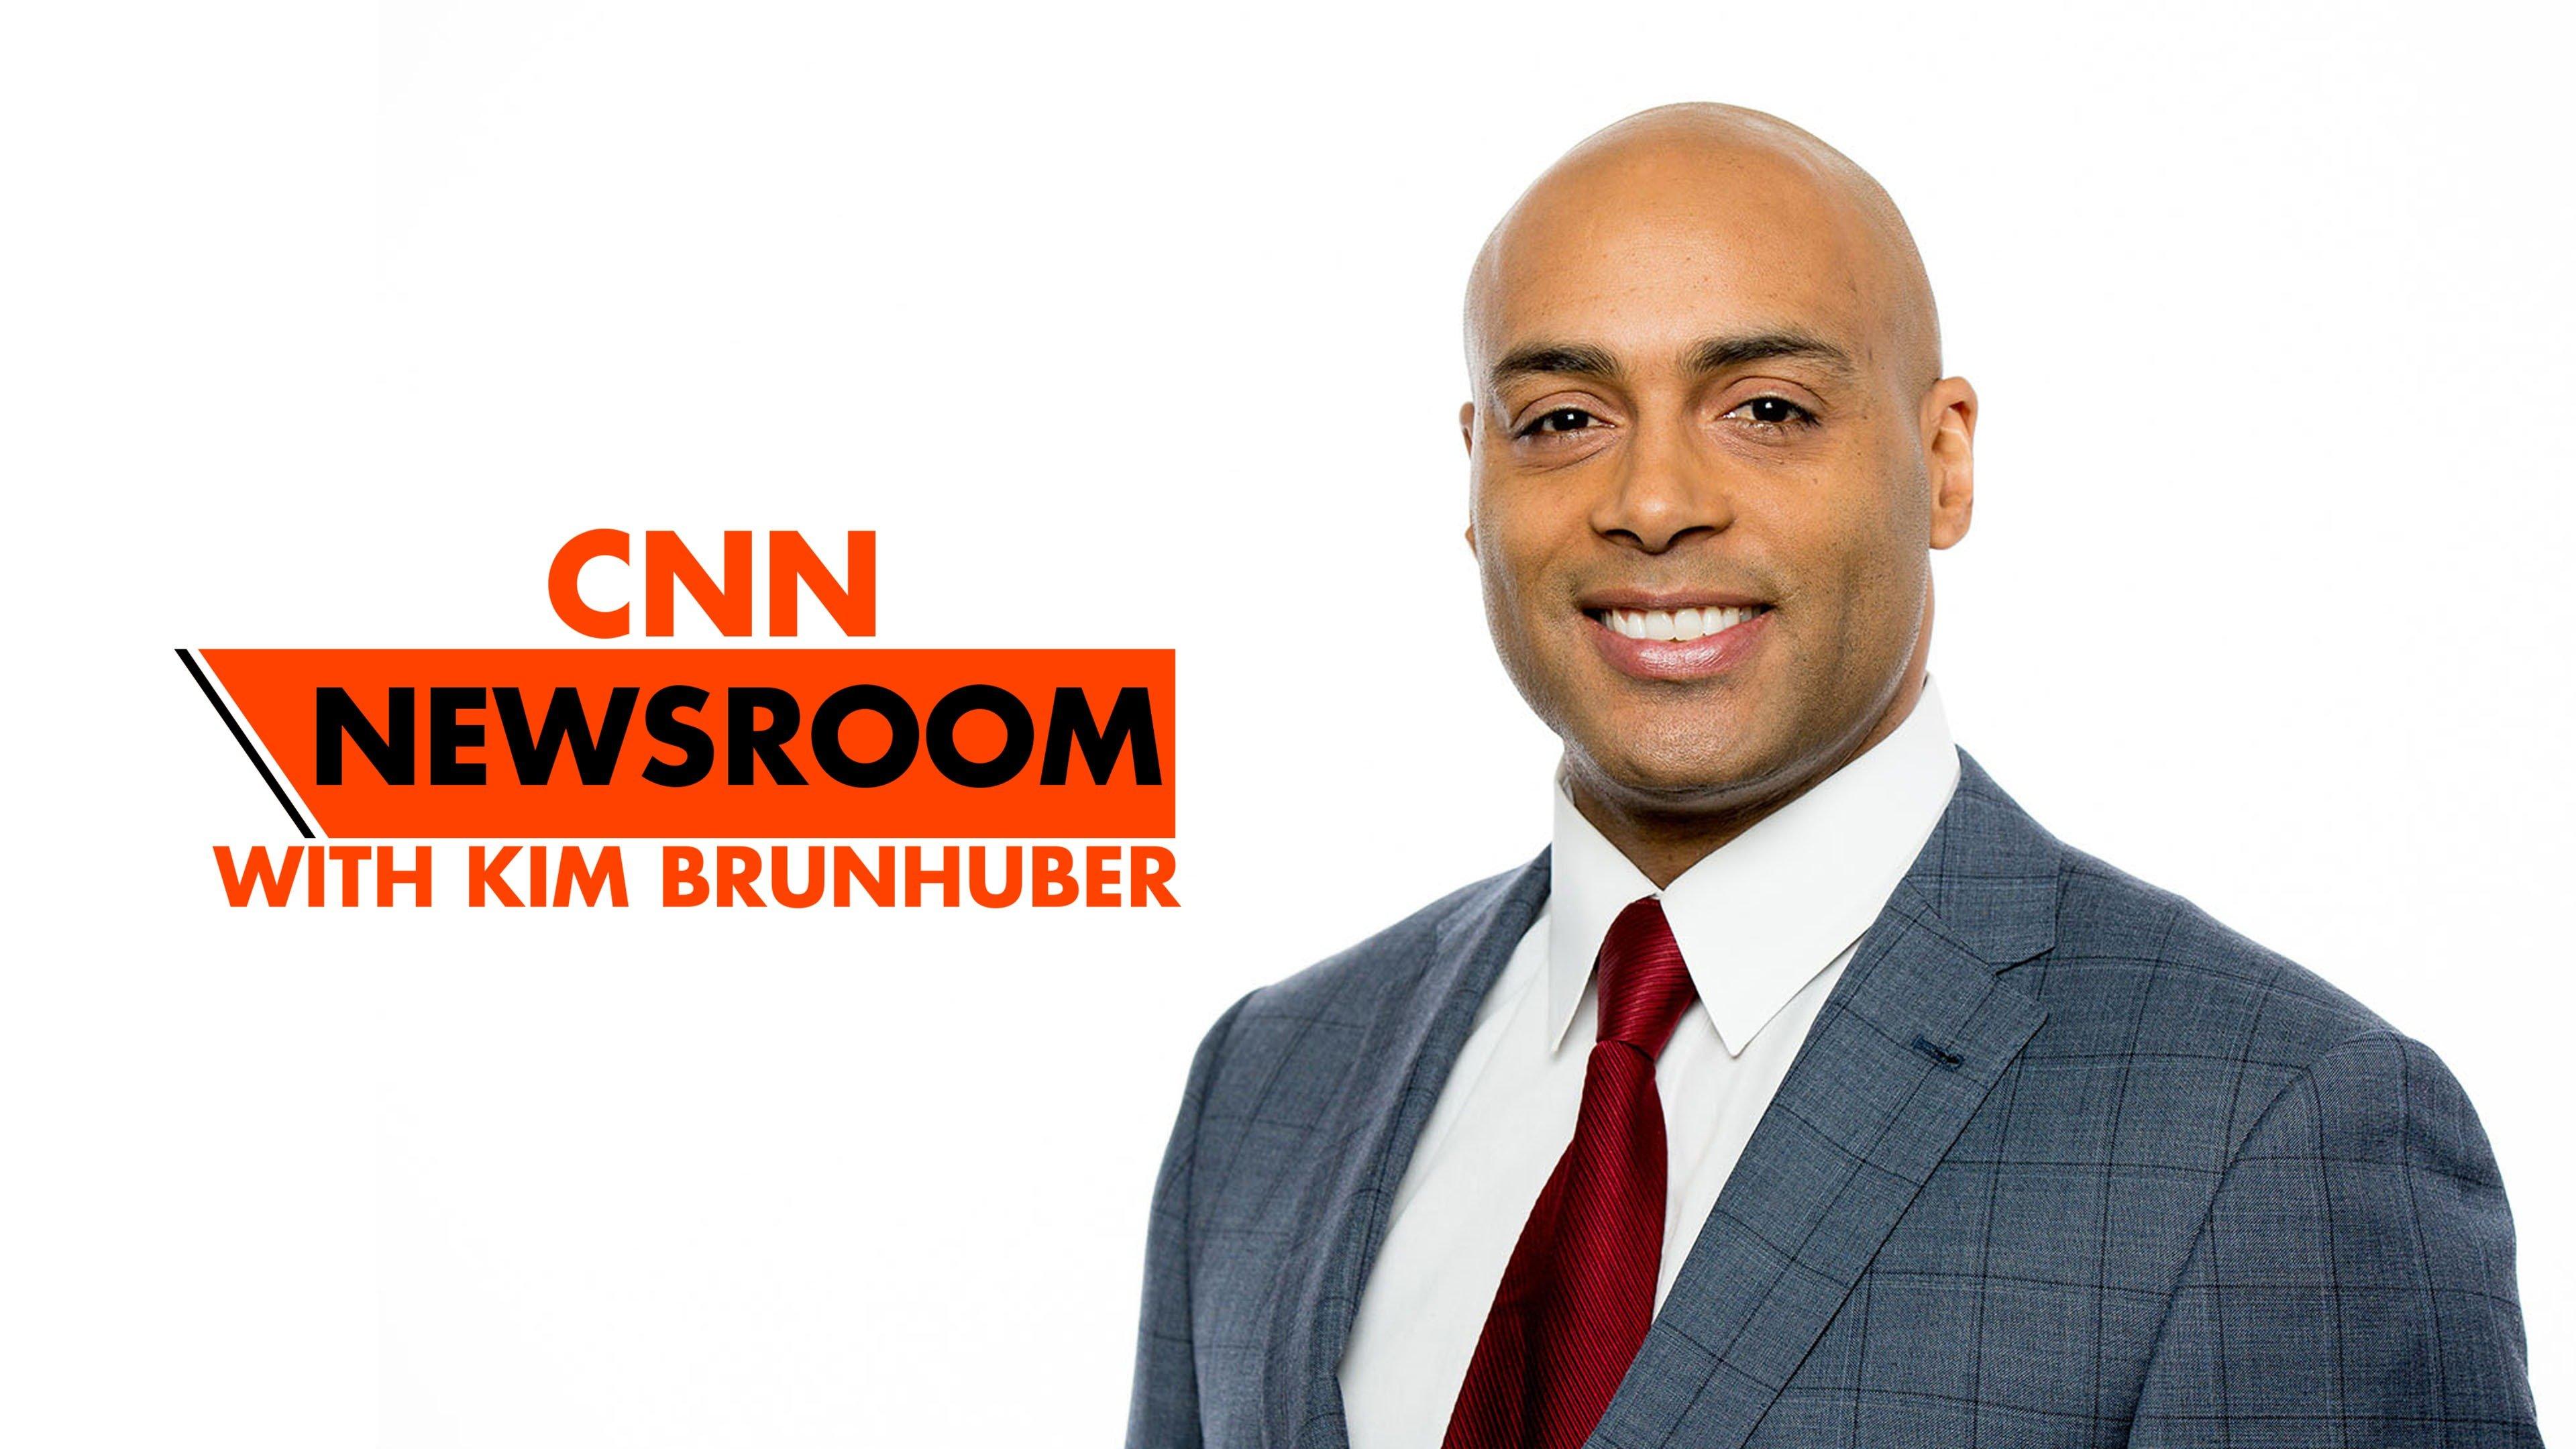 CNN Newsroom with Kim Brunhuber